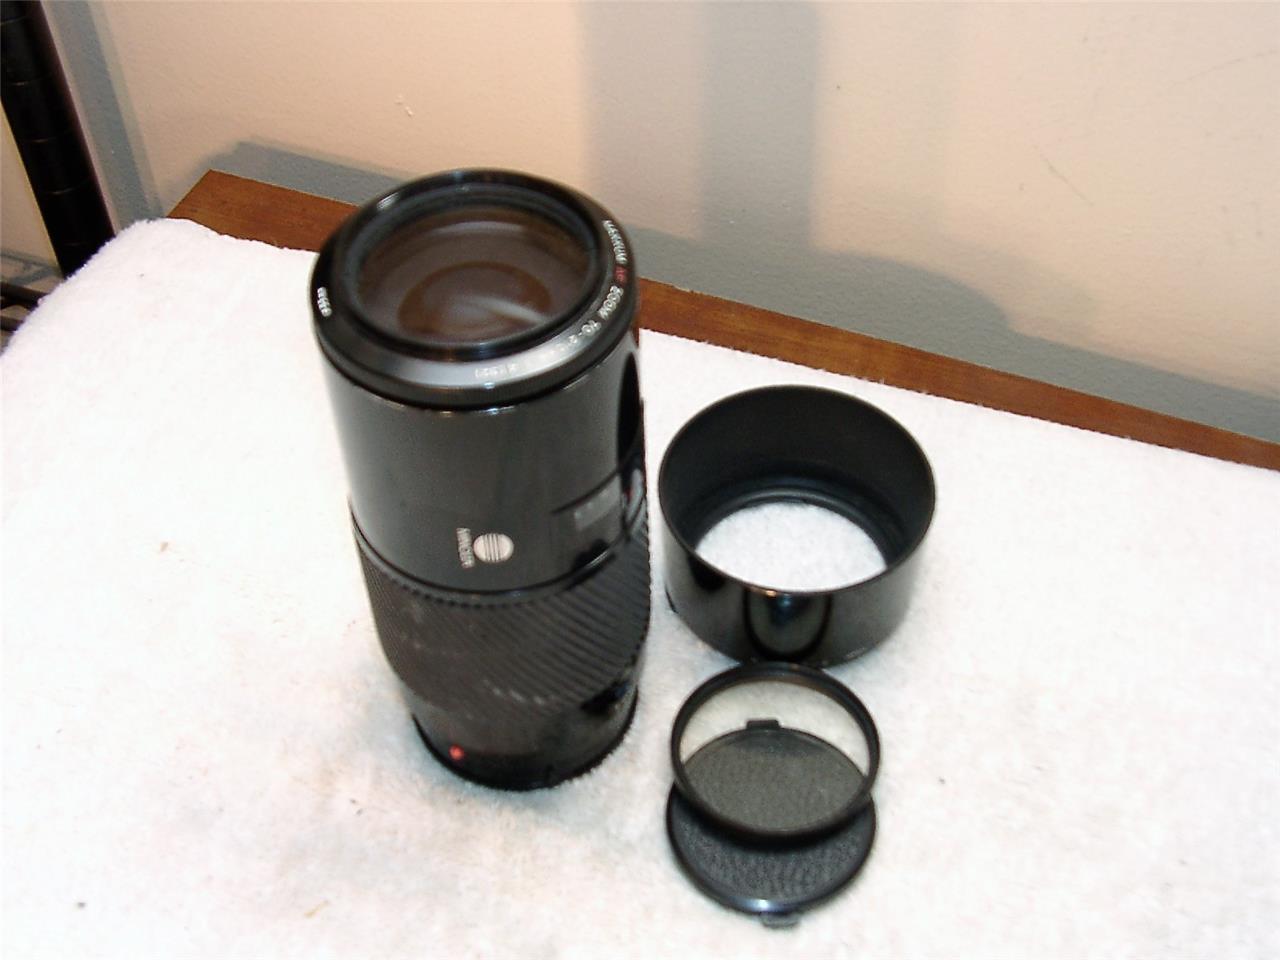 MINOLTA MAXXUM 70-210mm AF Macro BEERCAN LENS f/4 SONY ALPHA+Filter+Hood 1:4